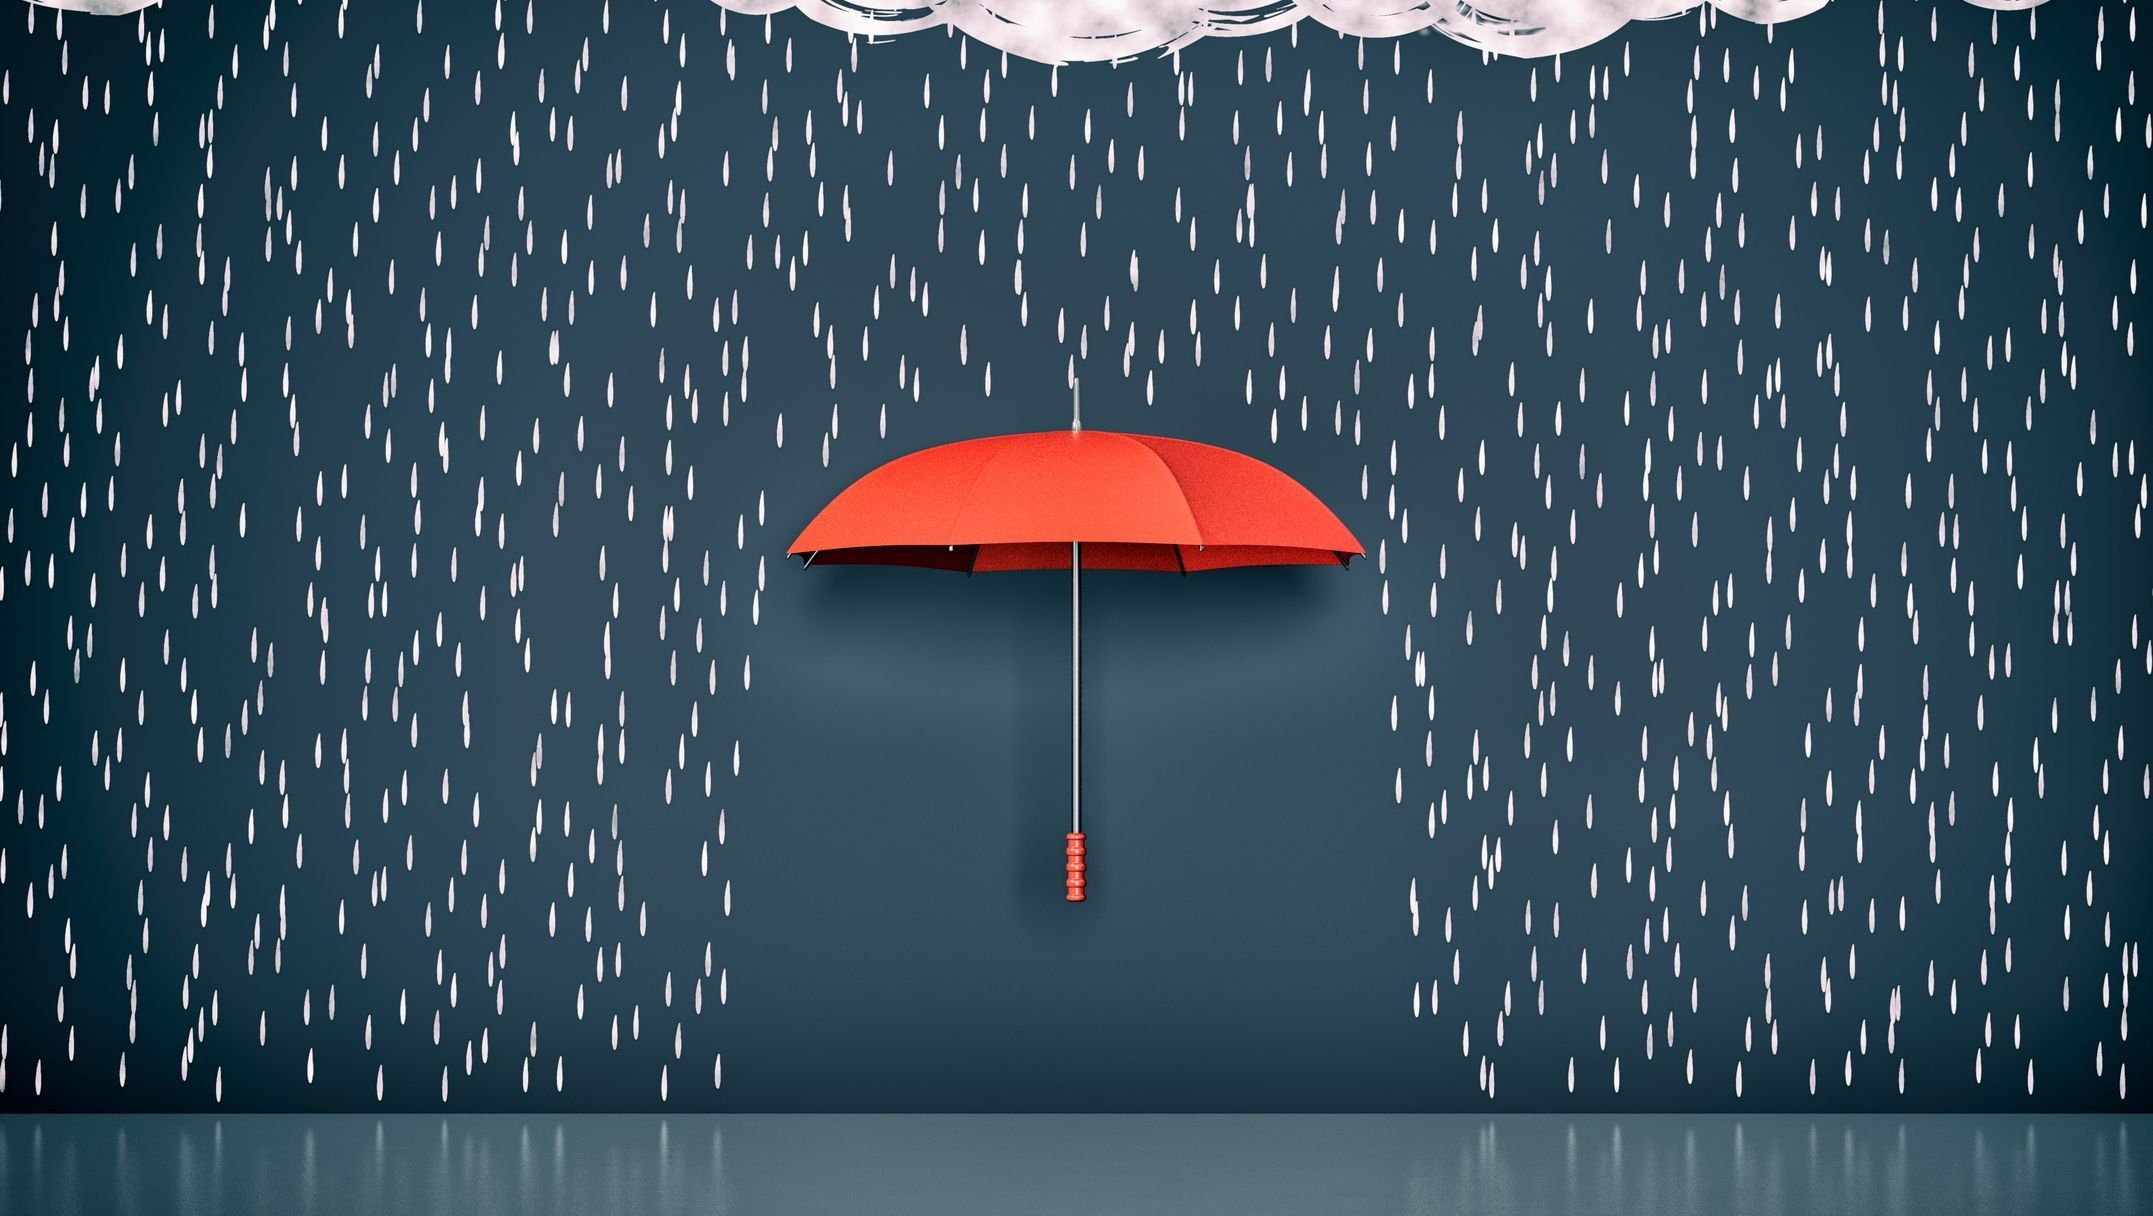 April showers wallpaper for desktops 63 images for Architecture upbrella